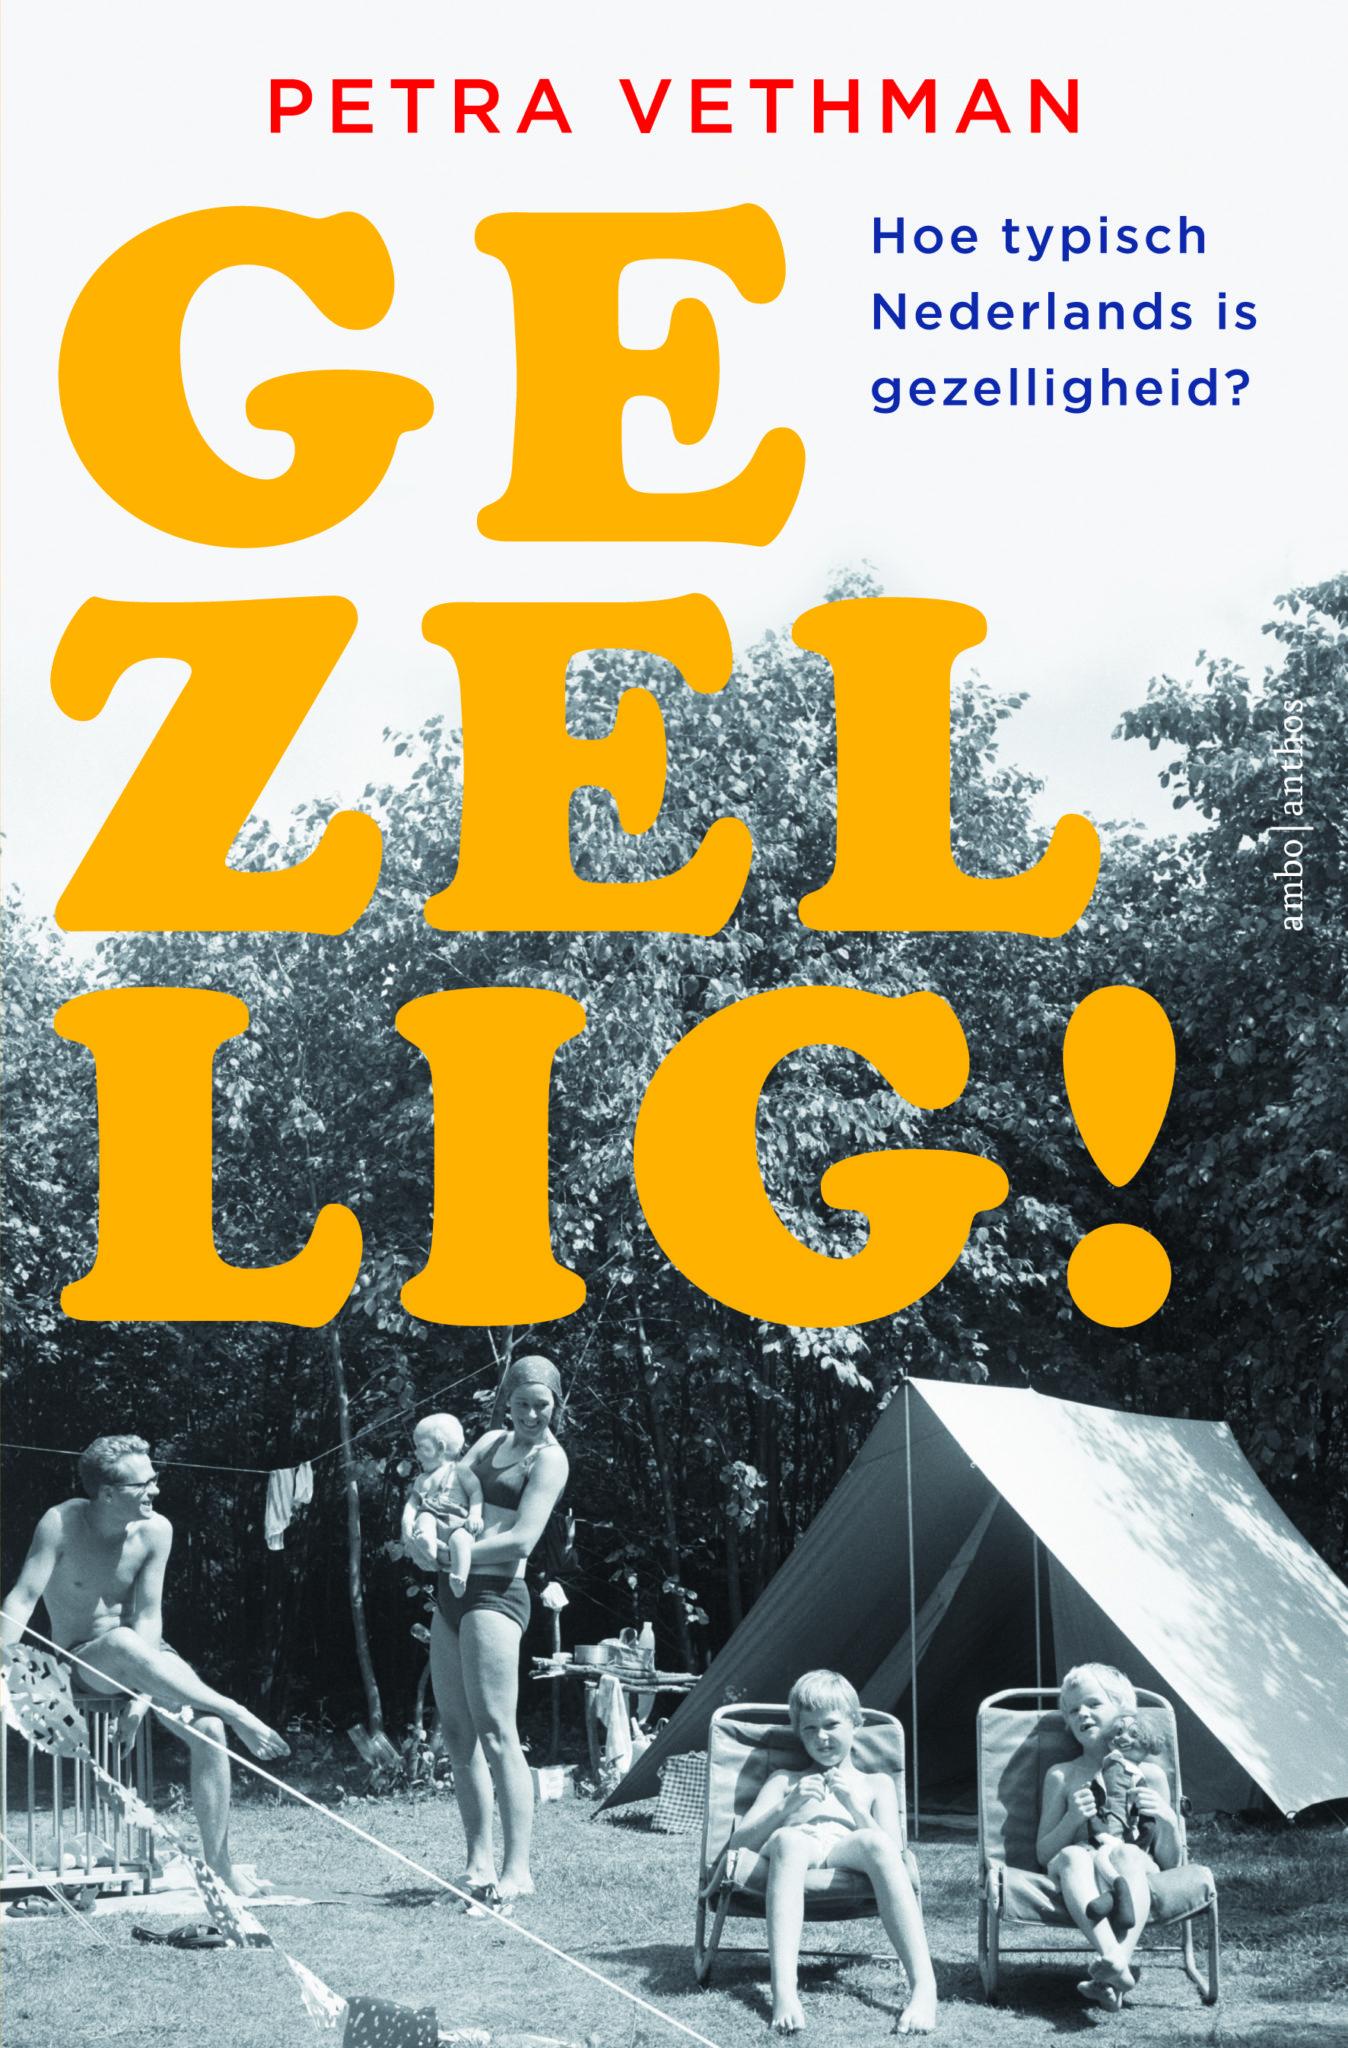 petra vethman, gezellig, boek, nederlandse cultuur